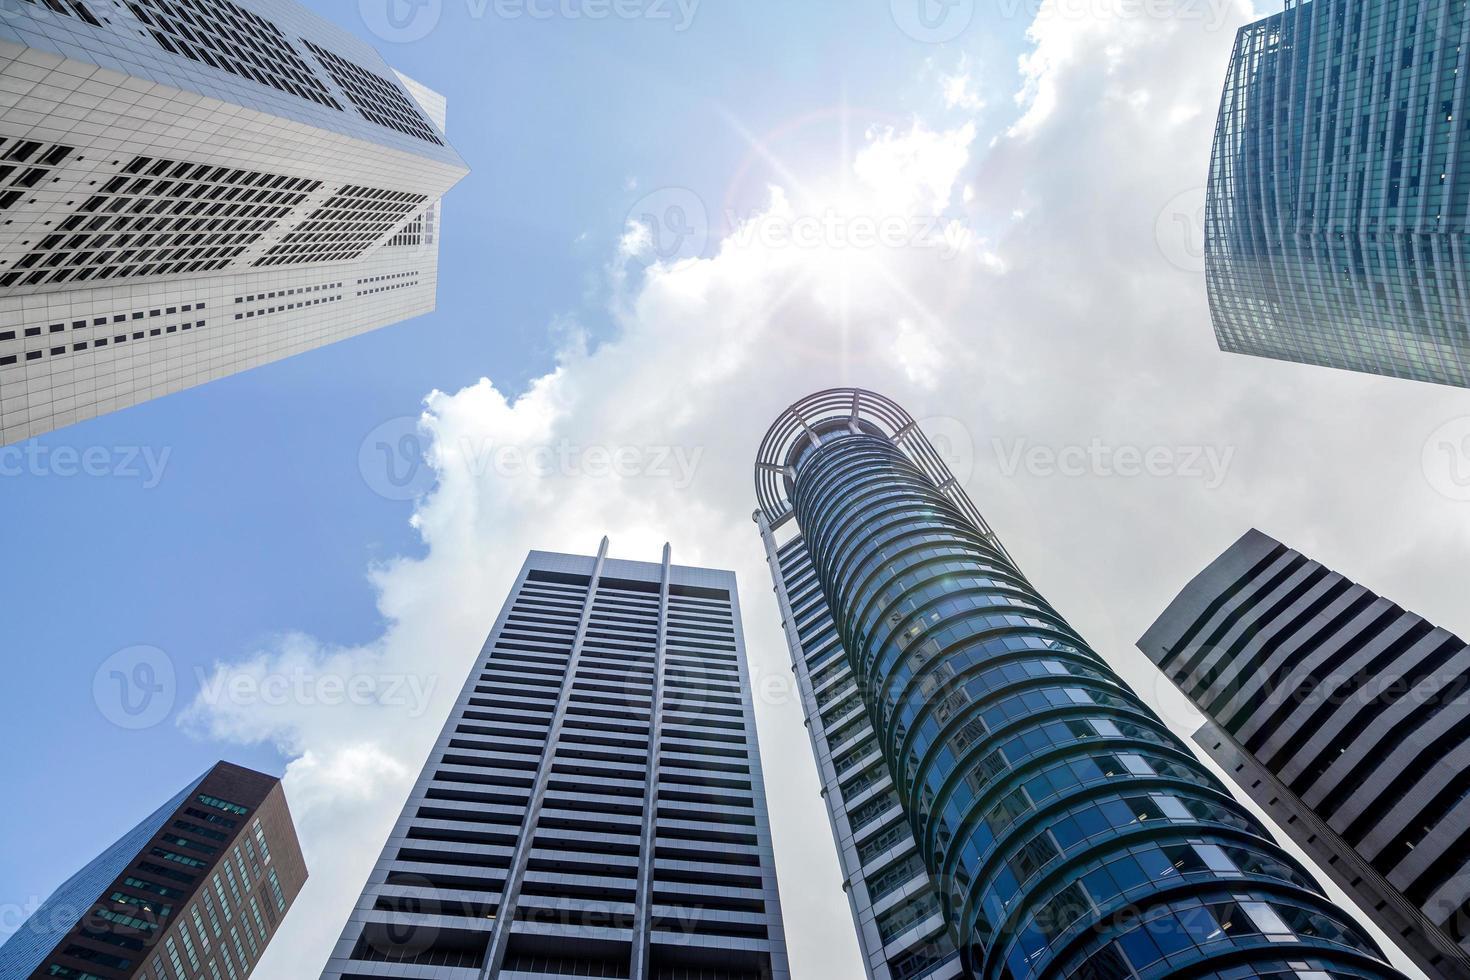 skyskrapor i finansdistriktet i singapore foto